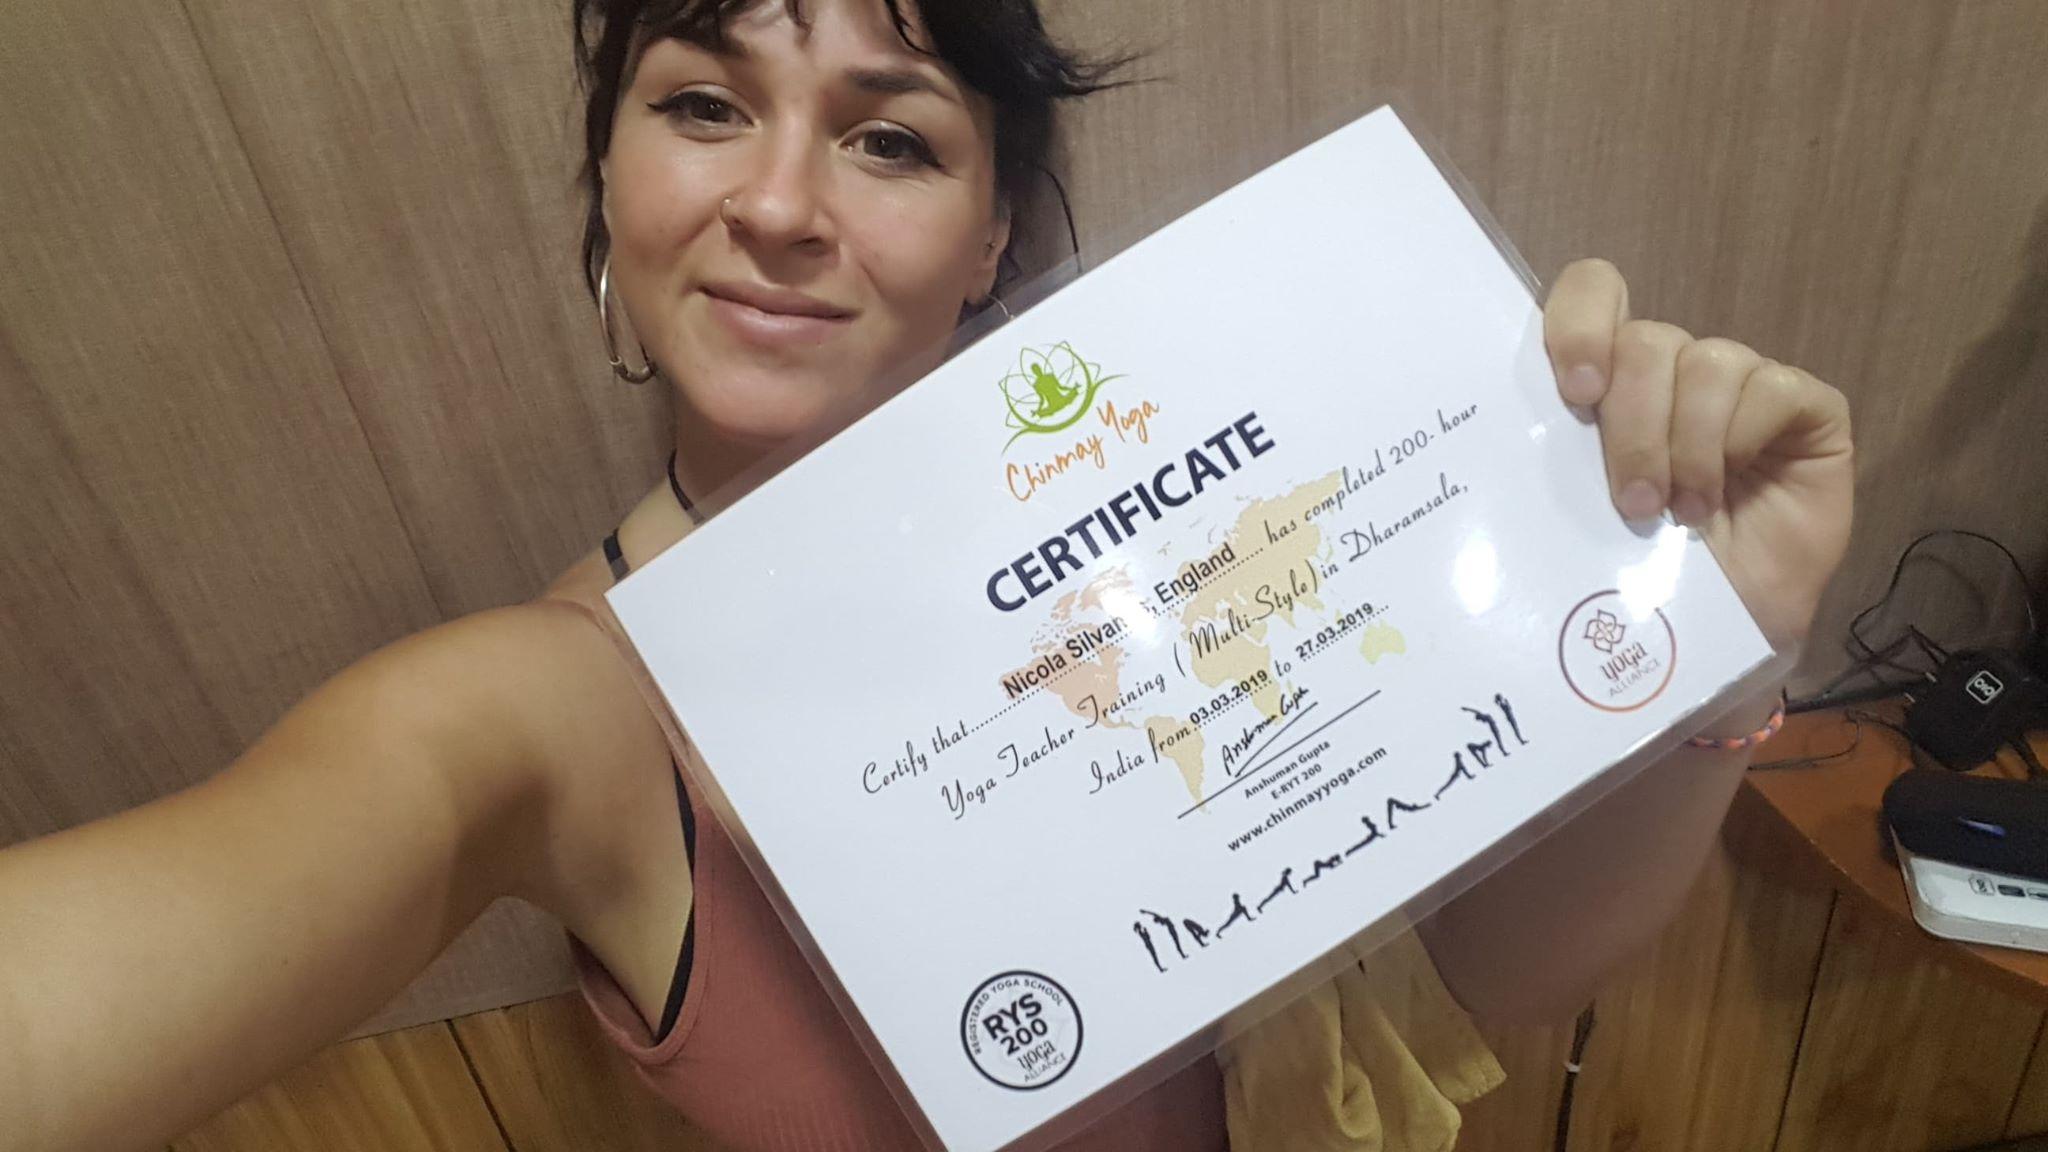 QUALIFIED! 200 hour Yoga Teacher